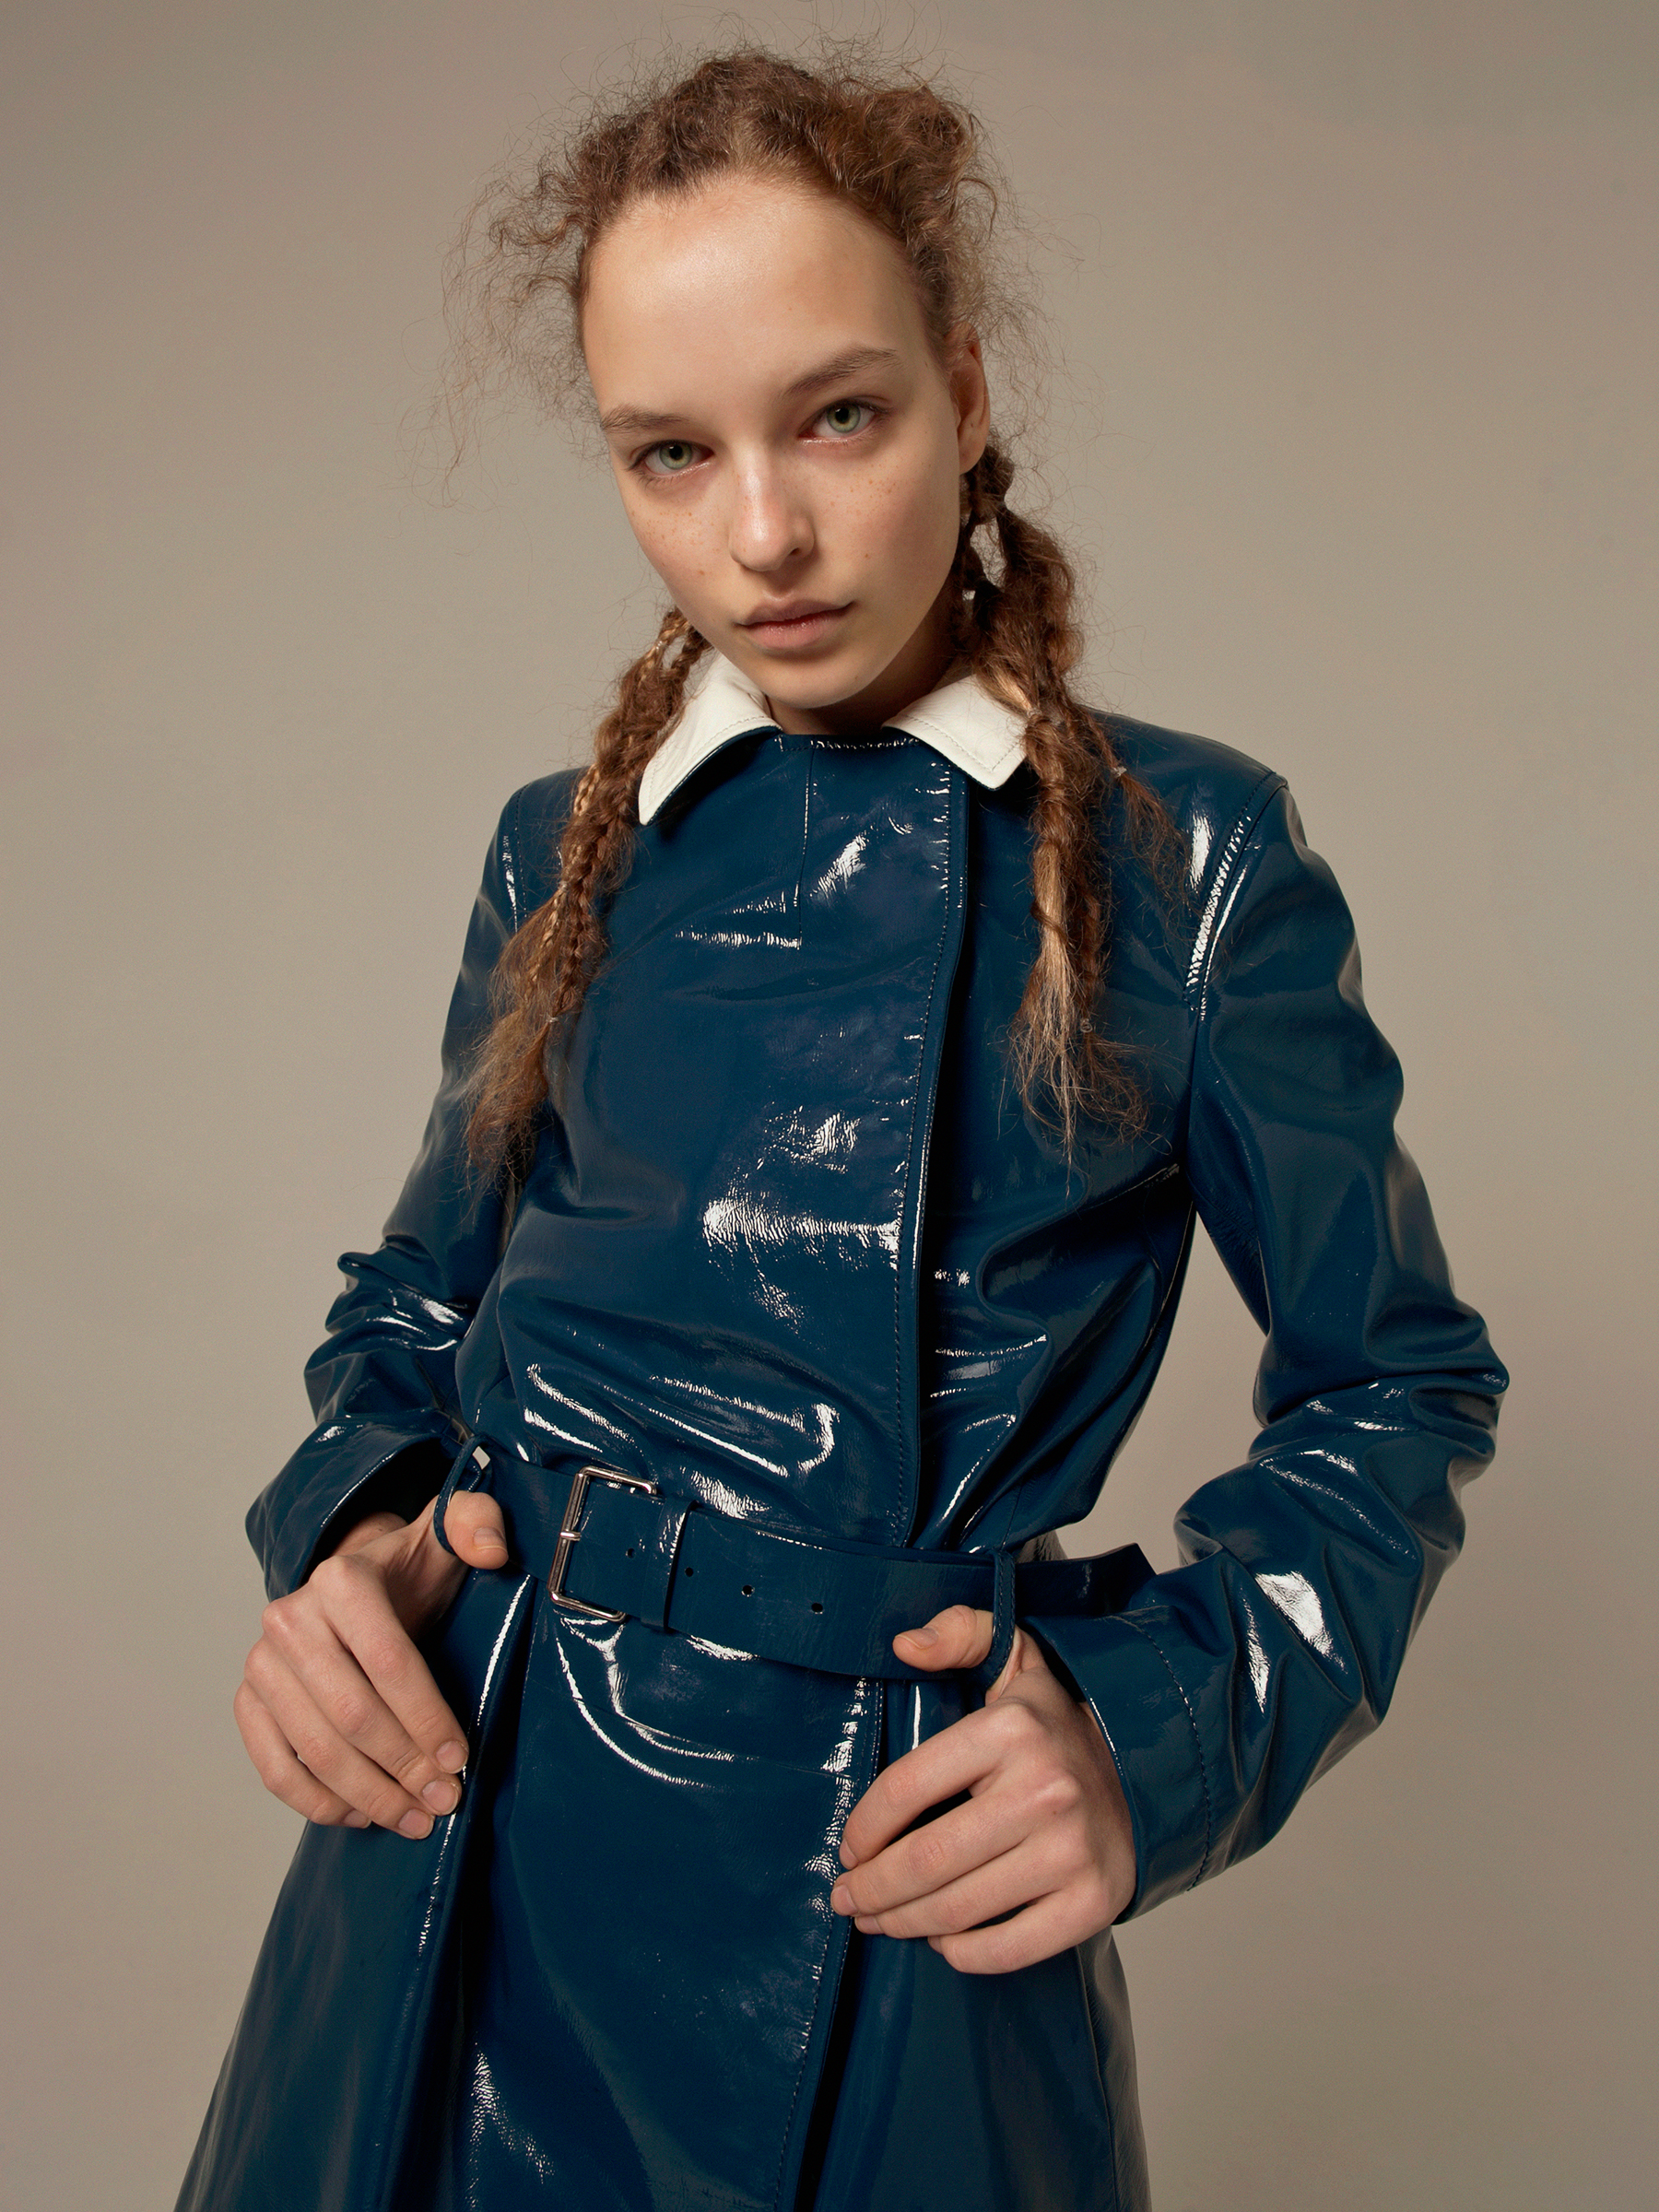 Hopscotch  Published On 05 December 2016   Photographer  Oksana Babenko  Stylist  Nikita Chekrugin  Hair stylist  Margarita Khanukaeva  Model  Lera Hudyaeva @YESmodels Russia